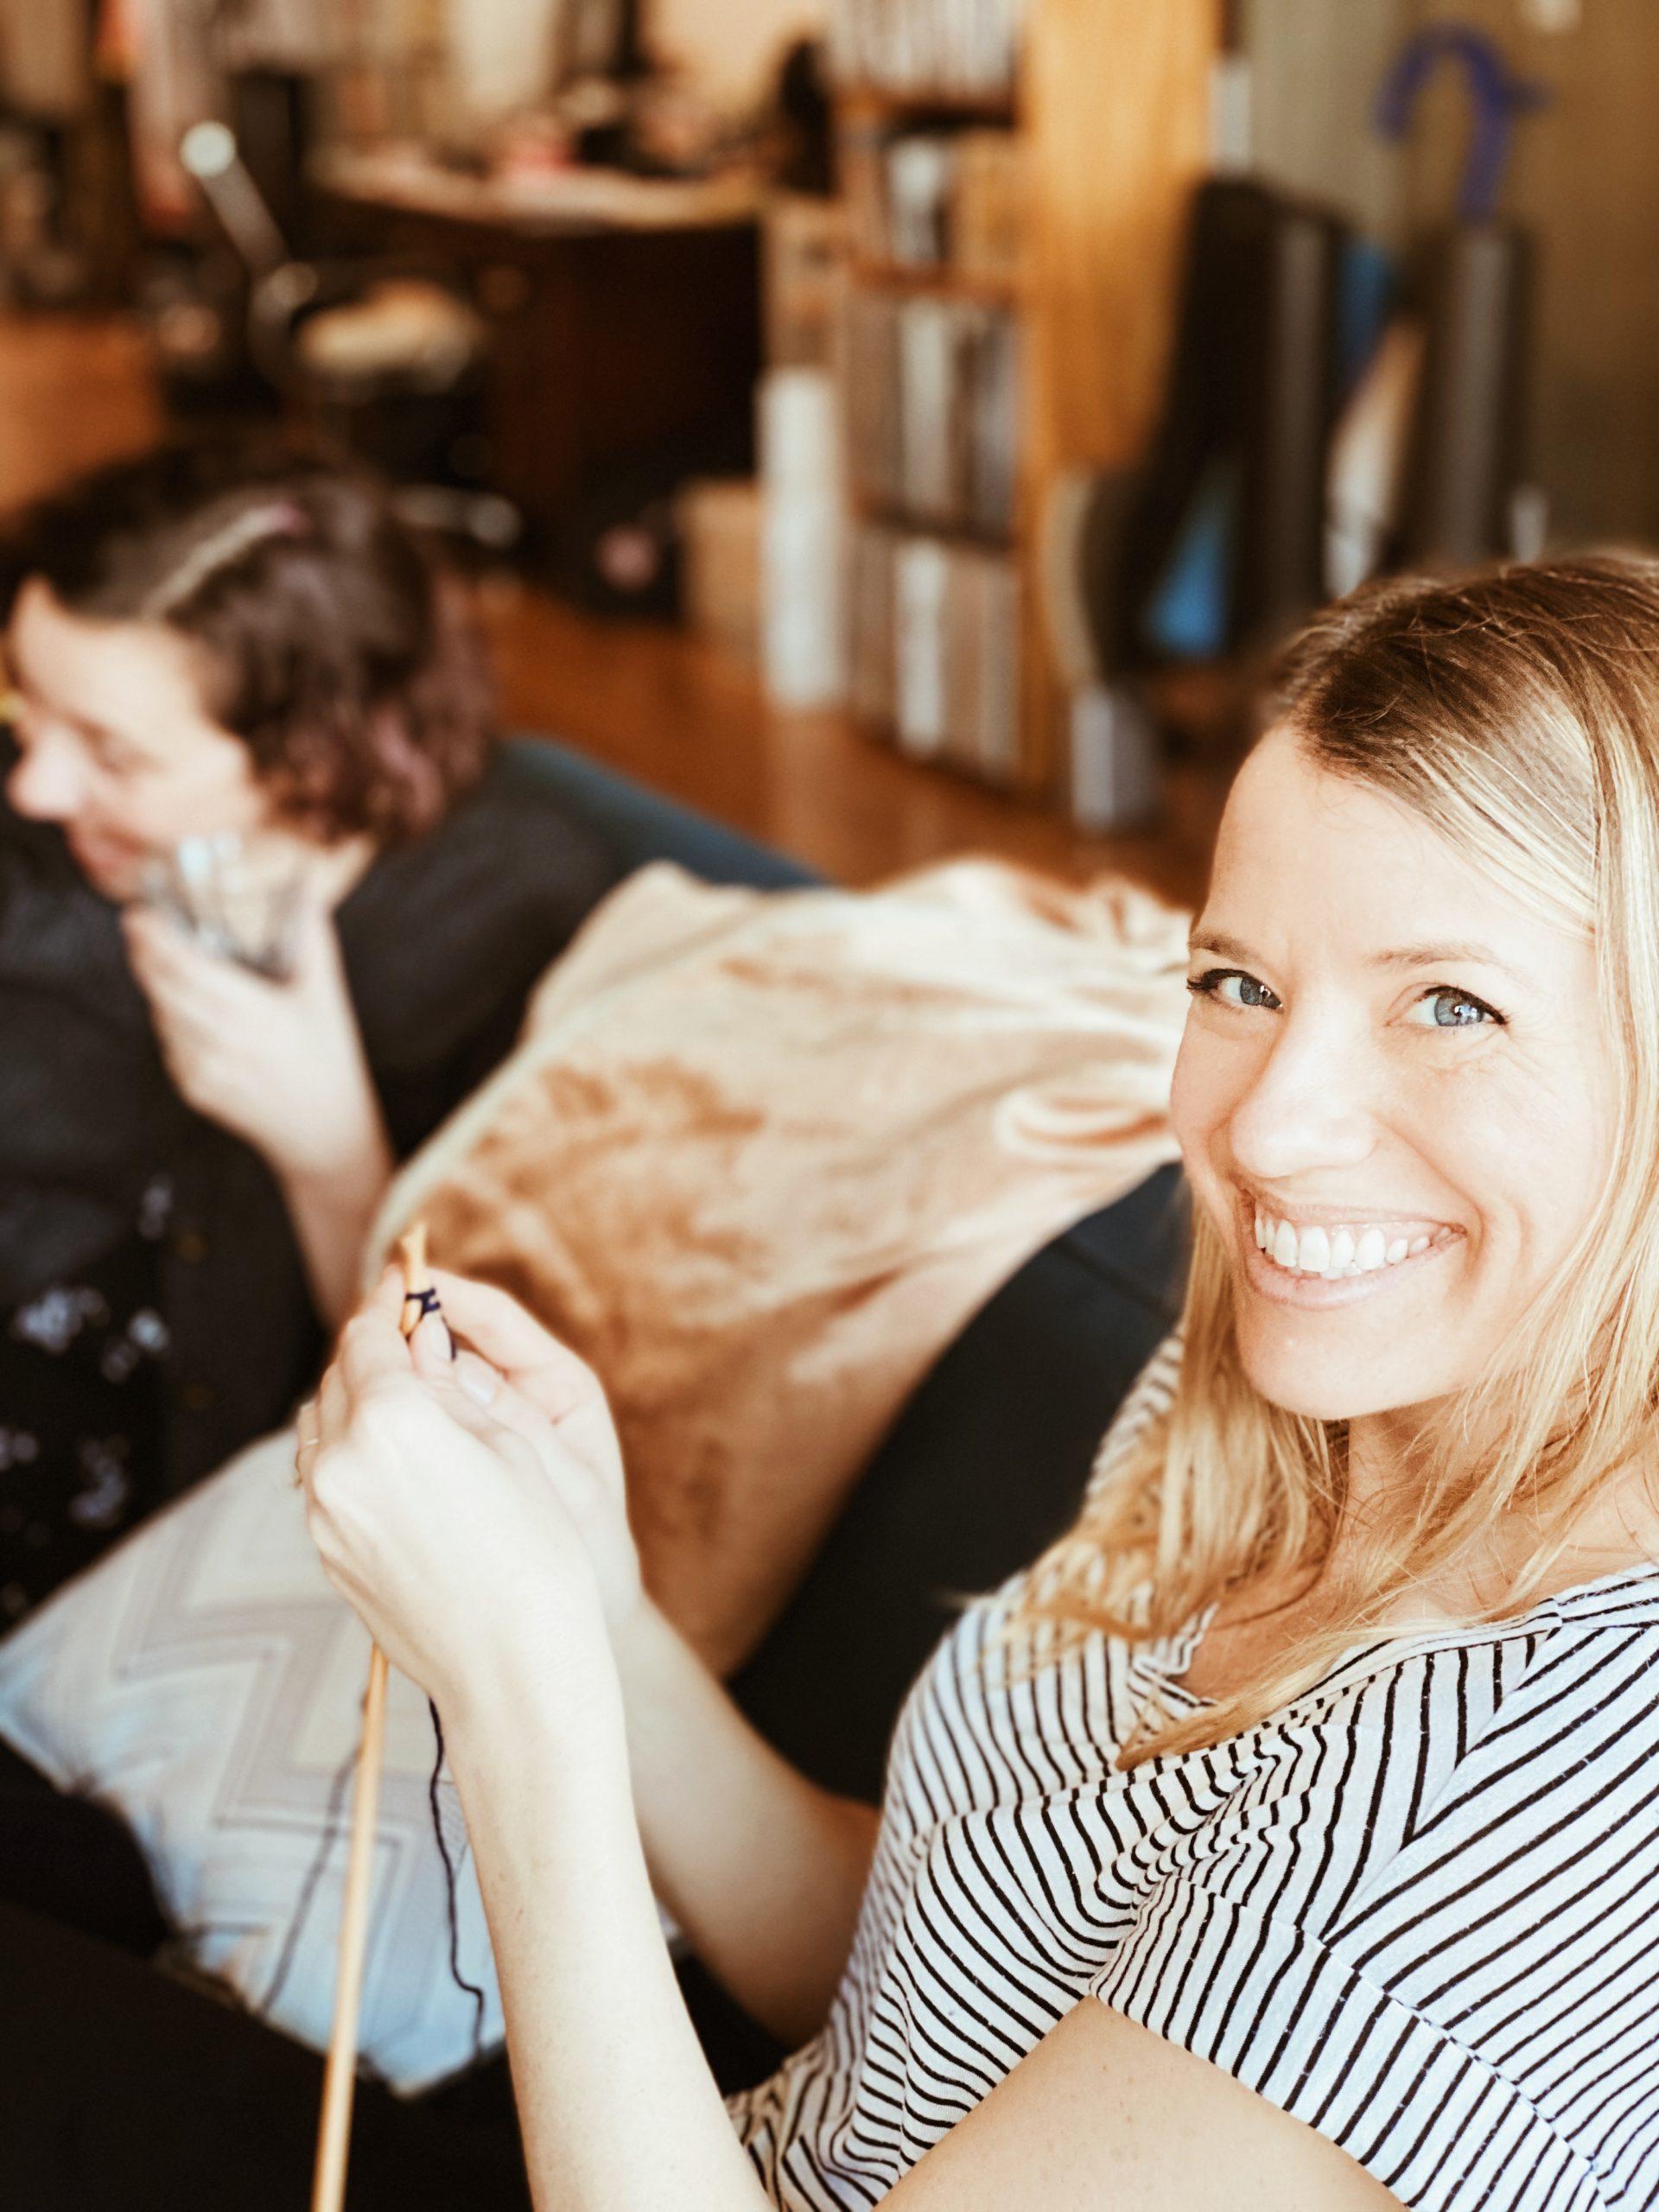 ashley evins knitting at oui